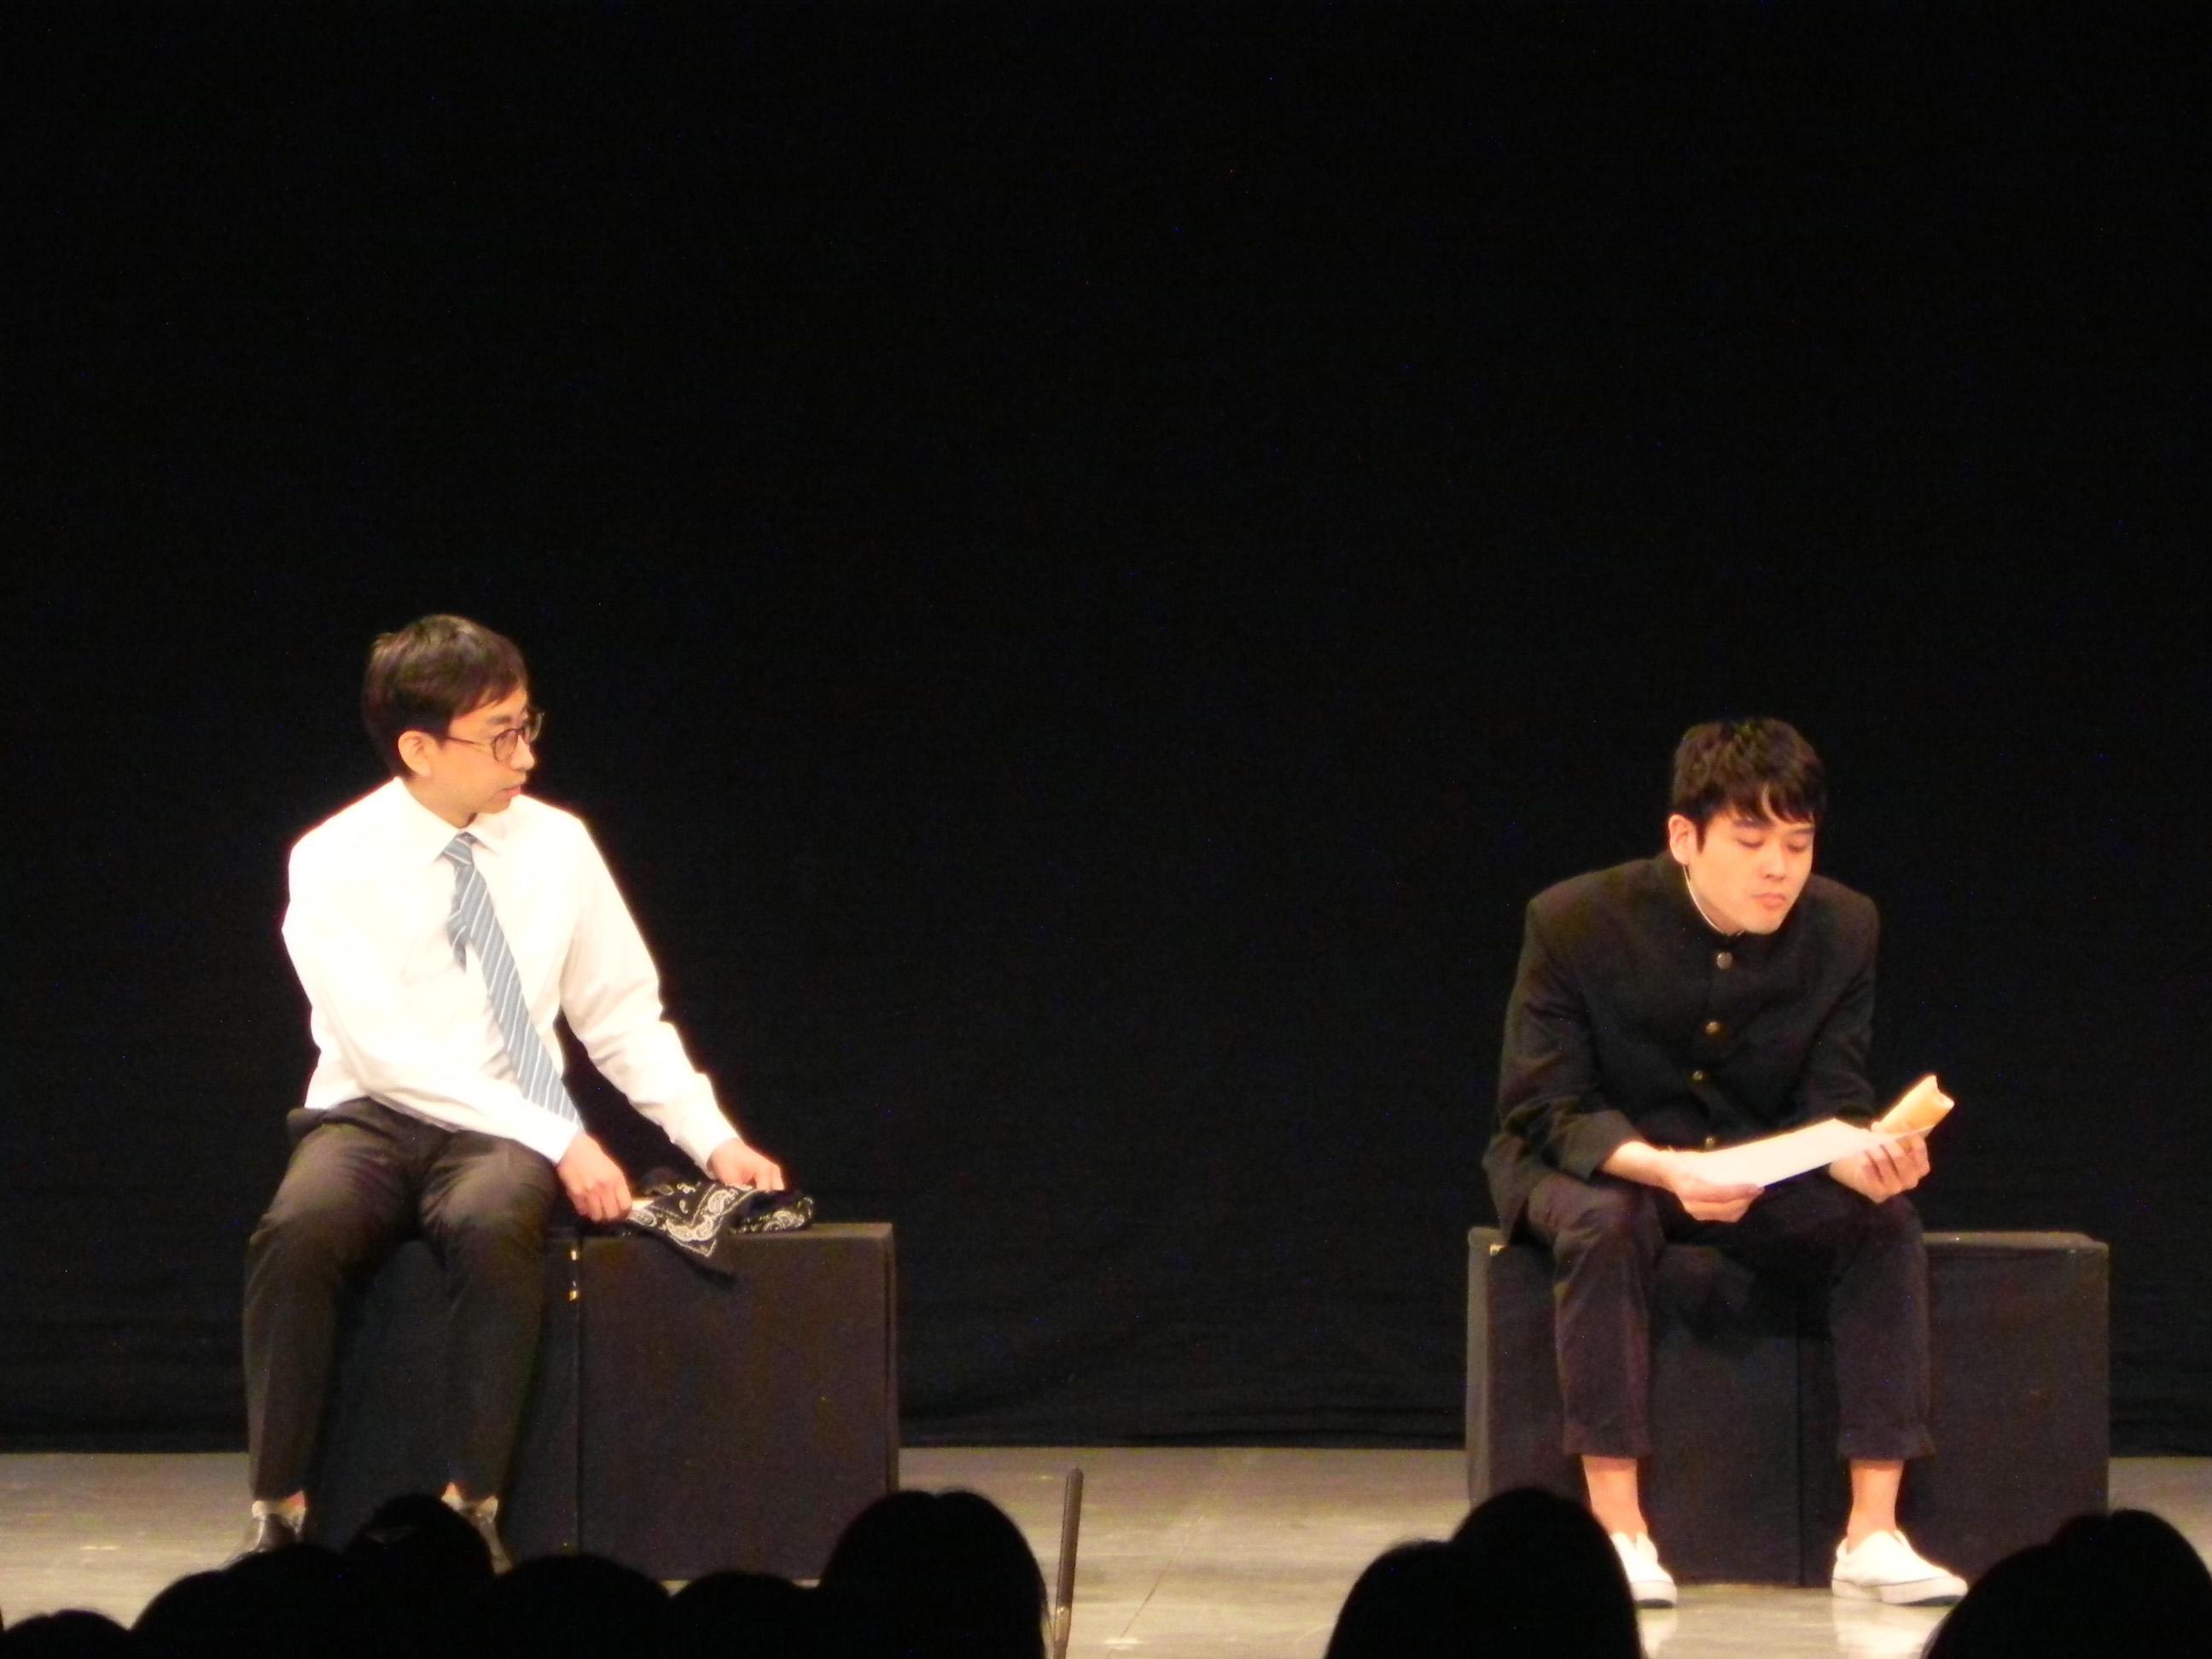 http://news.yoshimoto.co.jp/20170421205351-77b70635a3a86bc046396458f8dd884292f329ed.jpg